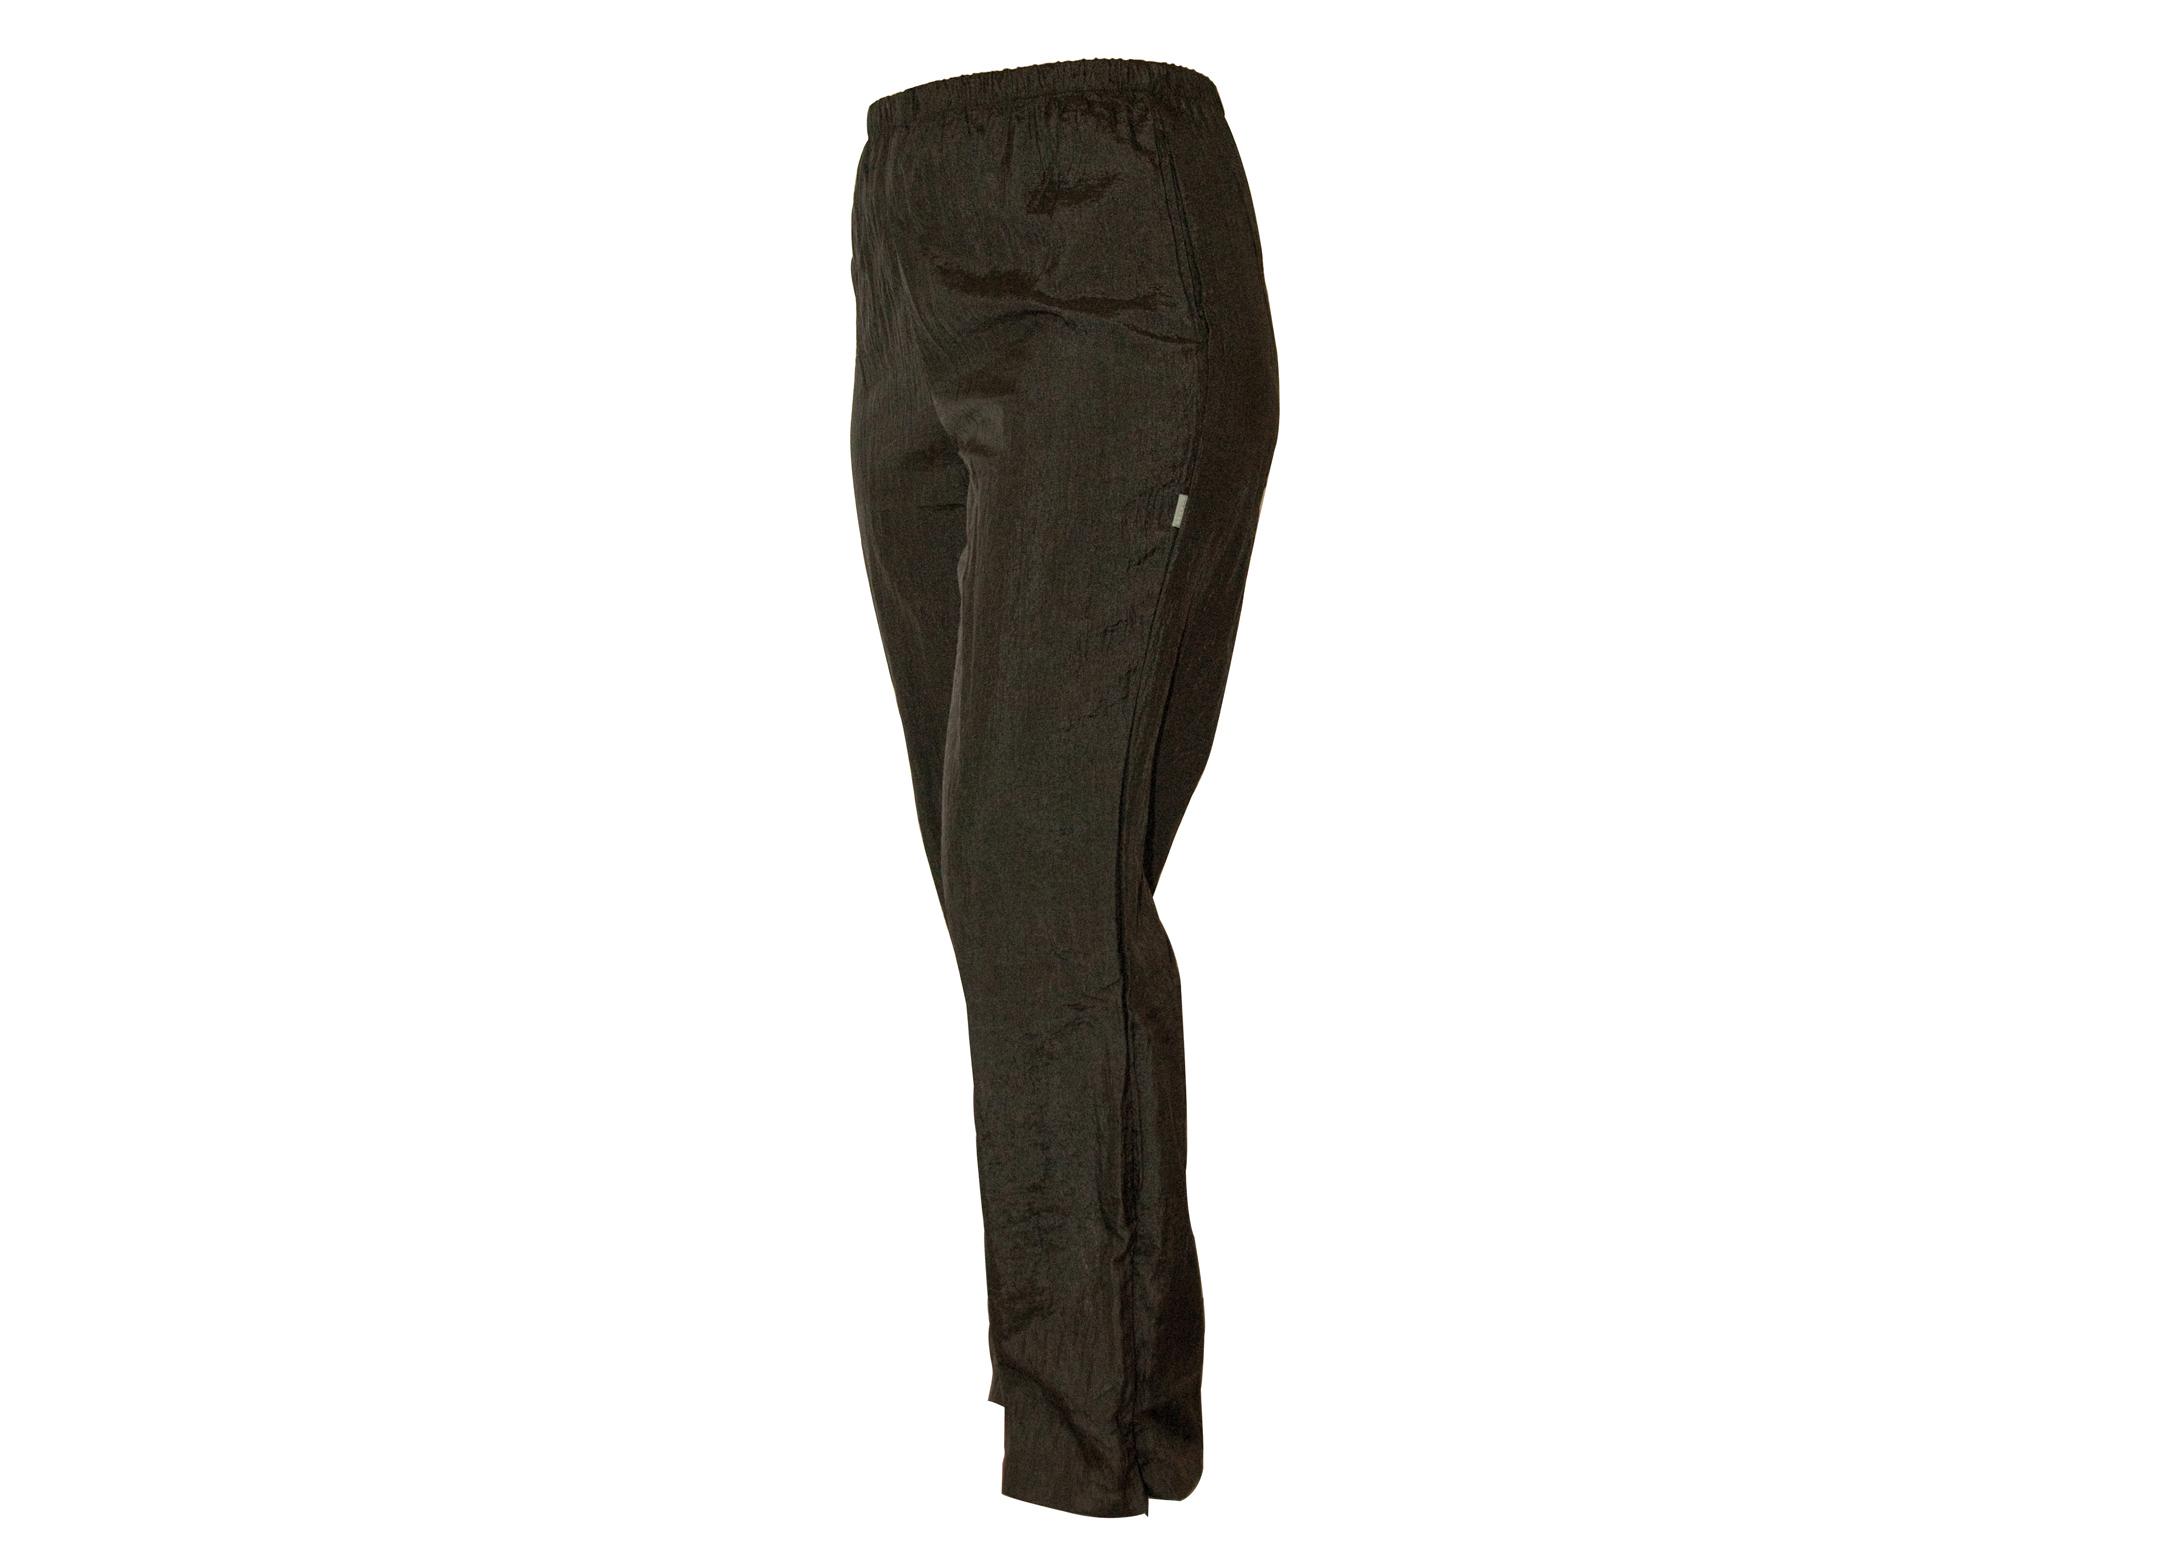 Tikima Galeria Trouser for Groomers